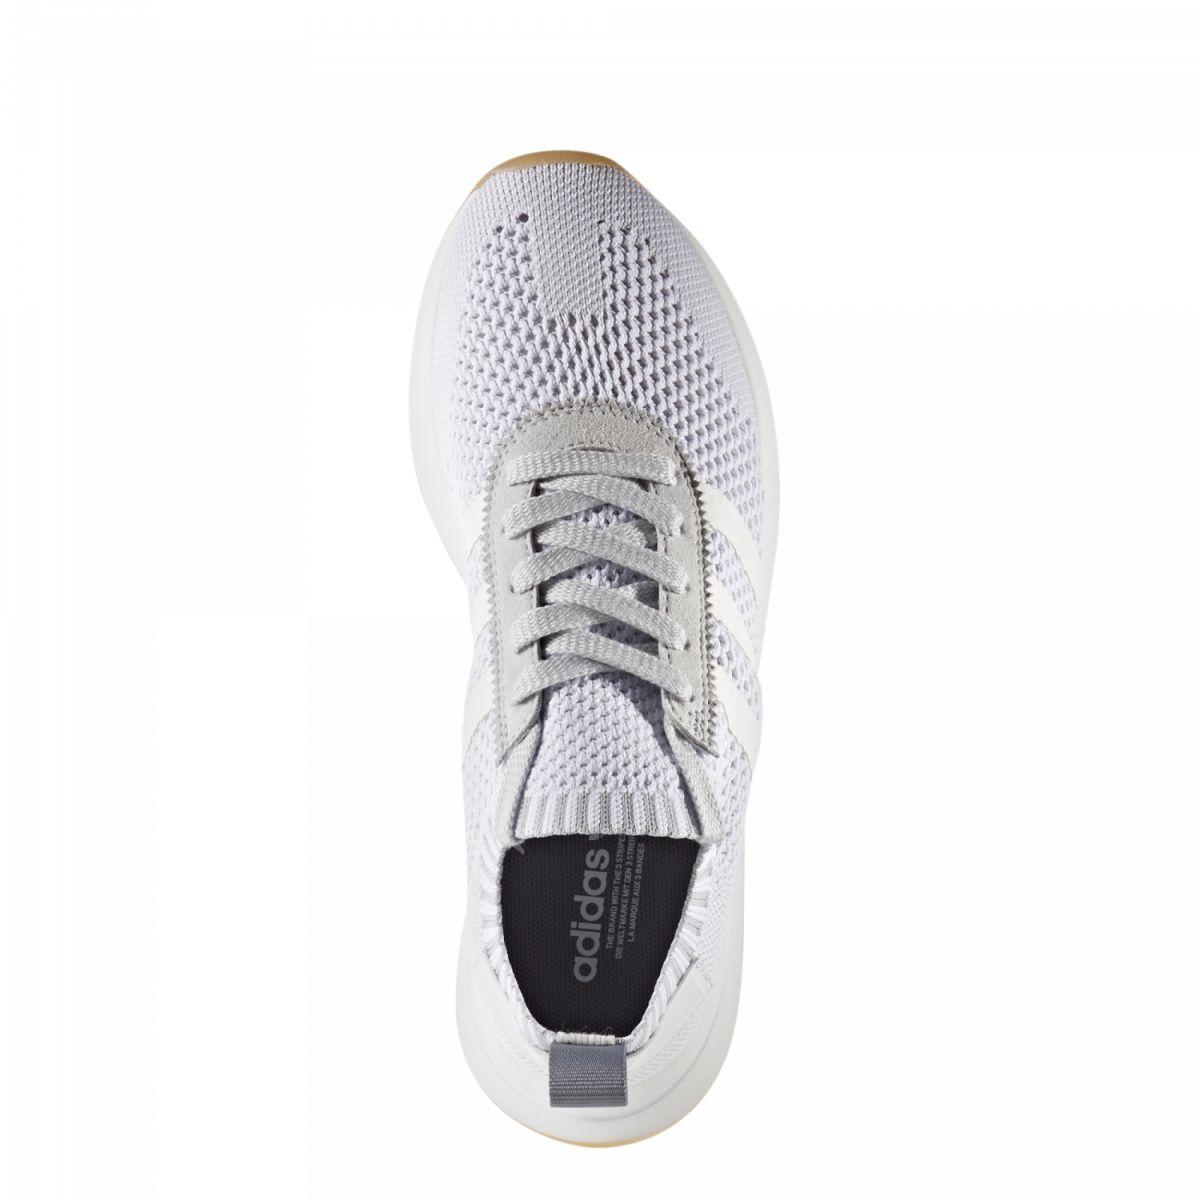 adidas originals flashback pk sneaker damen schuhe wei grau by9099 sport klingenmaier. Black Bedroom Furniture Sets. Home Design Ideas